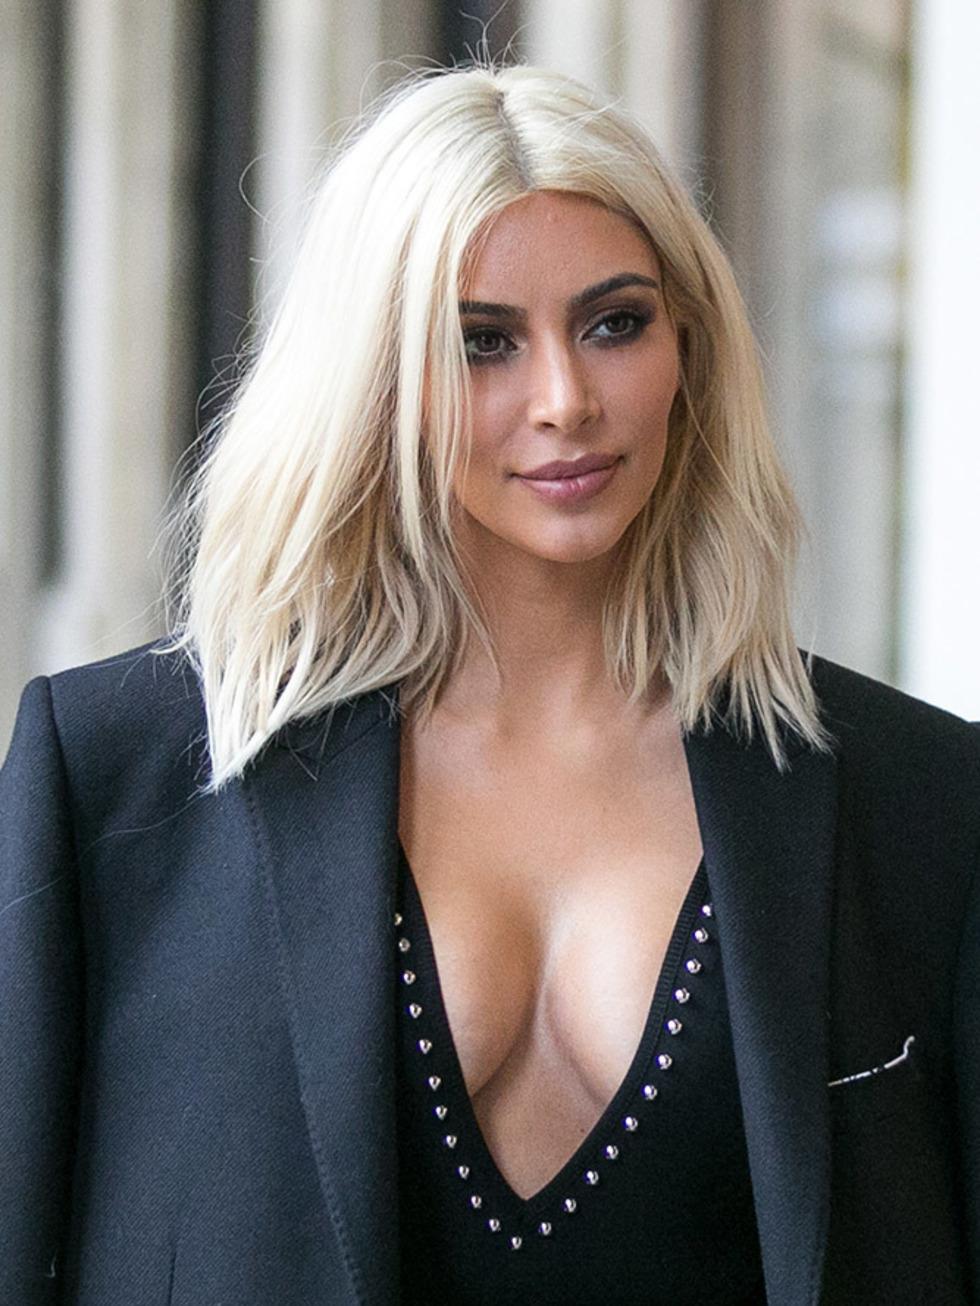 Image result for kim kardashian 2017 hair